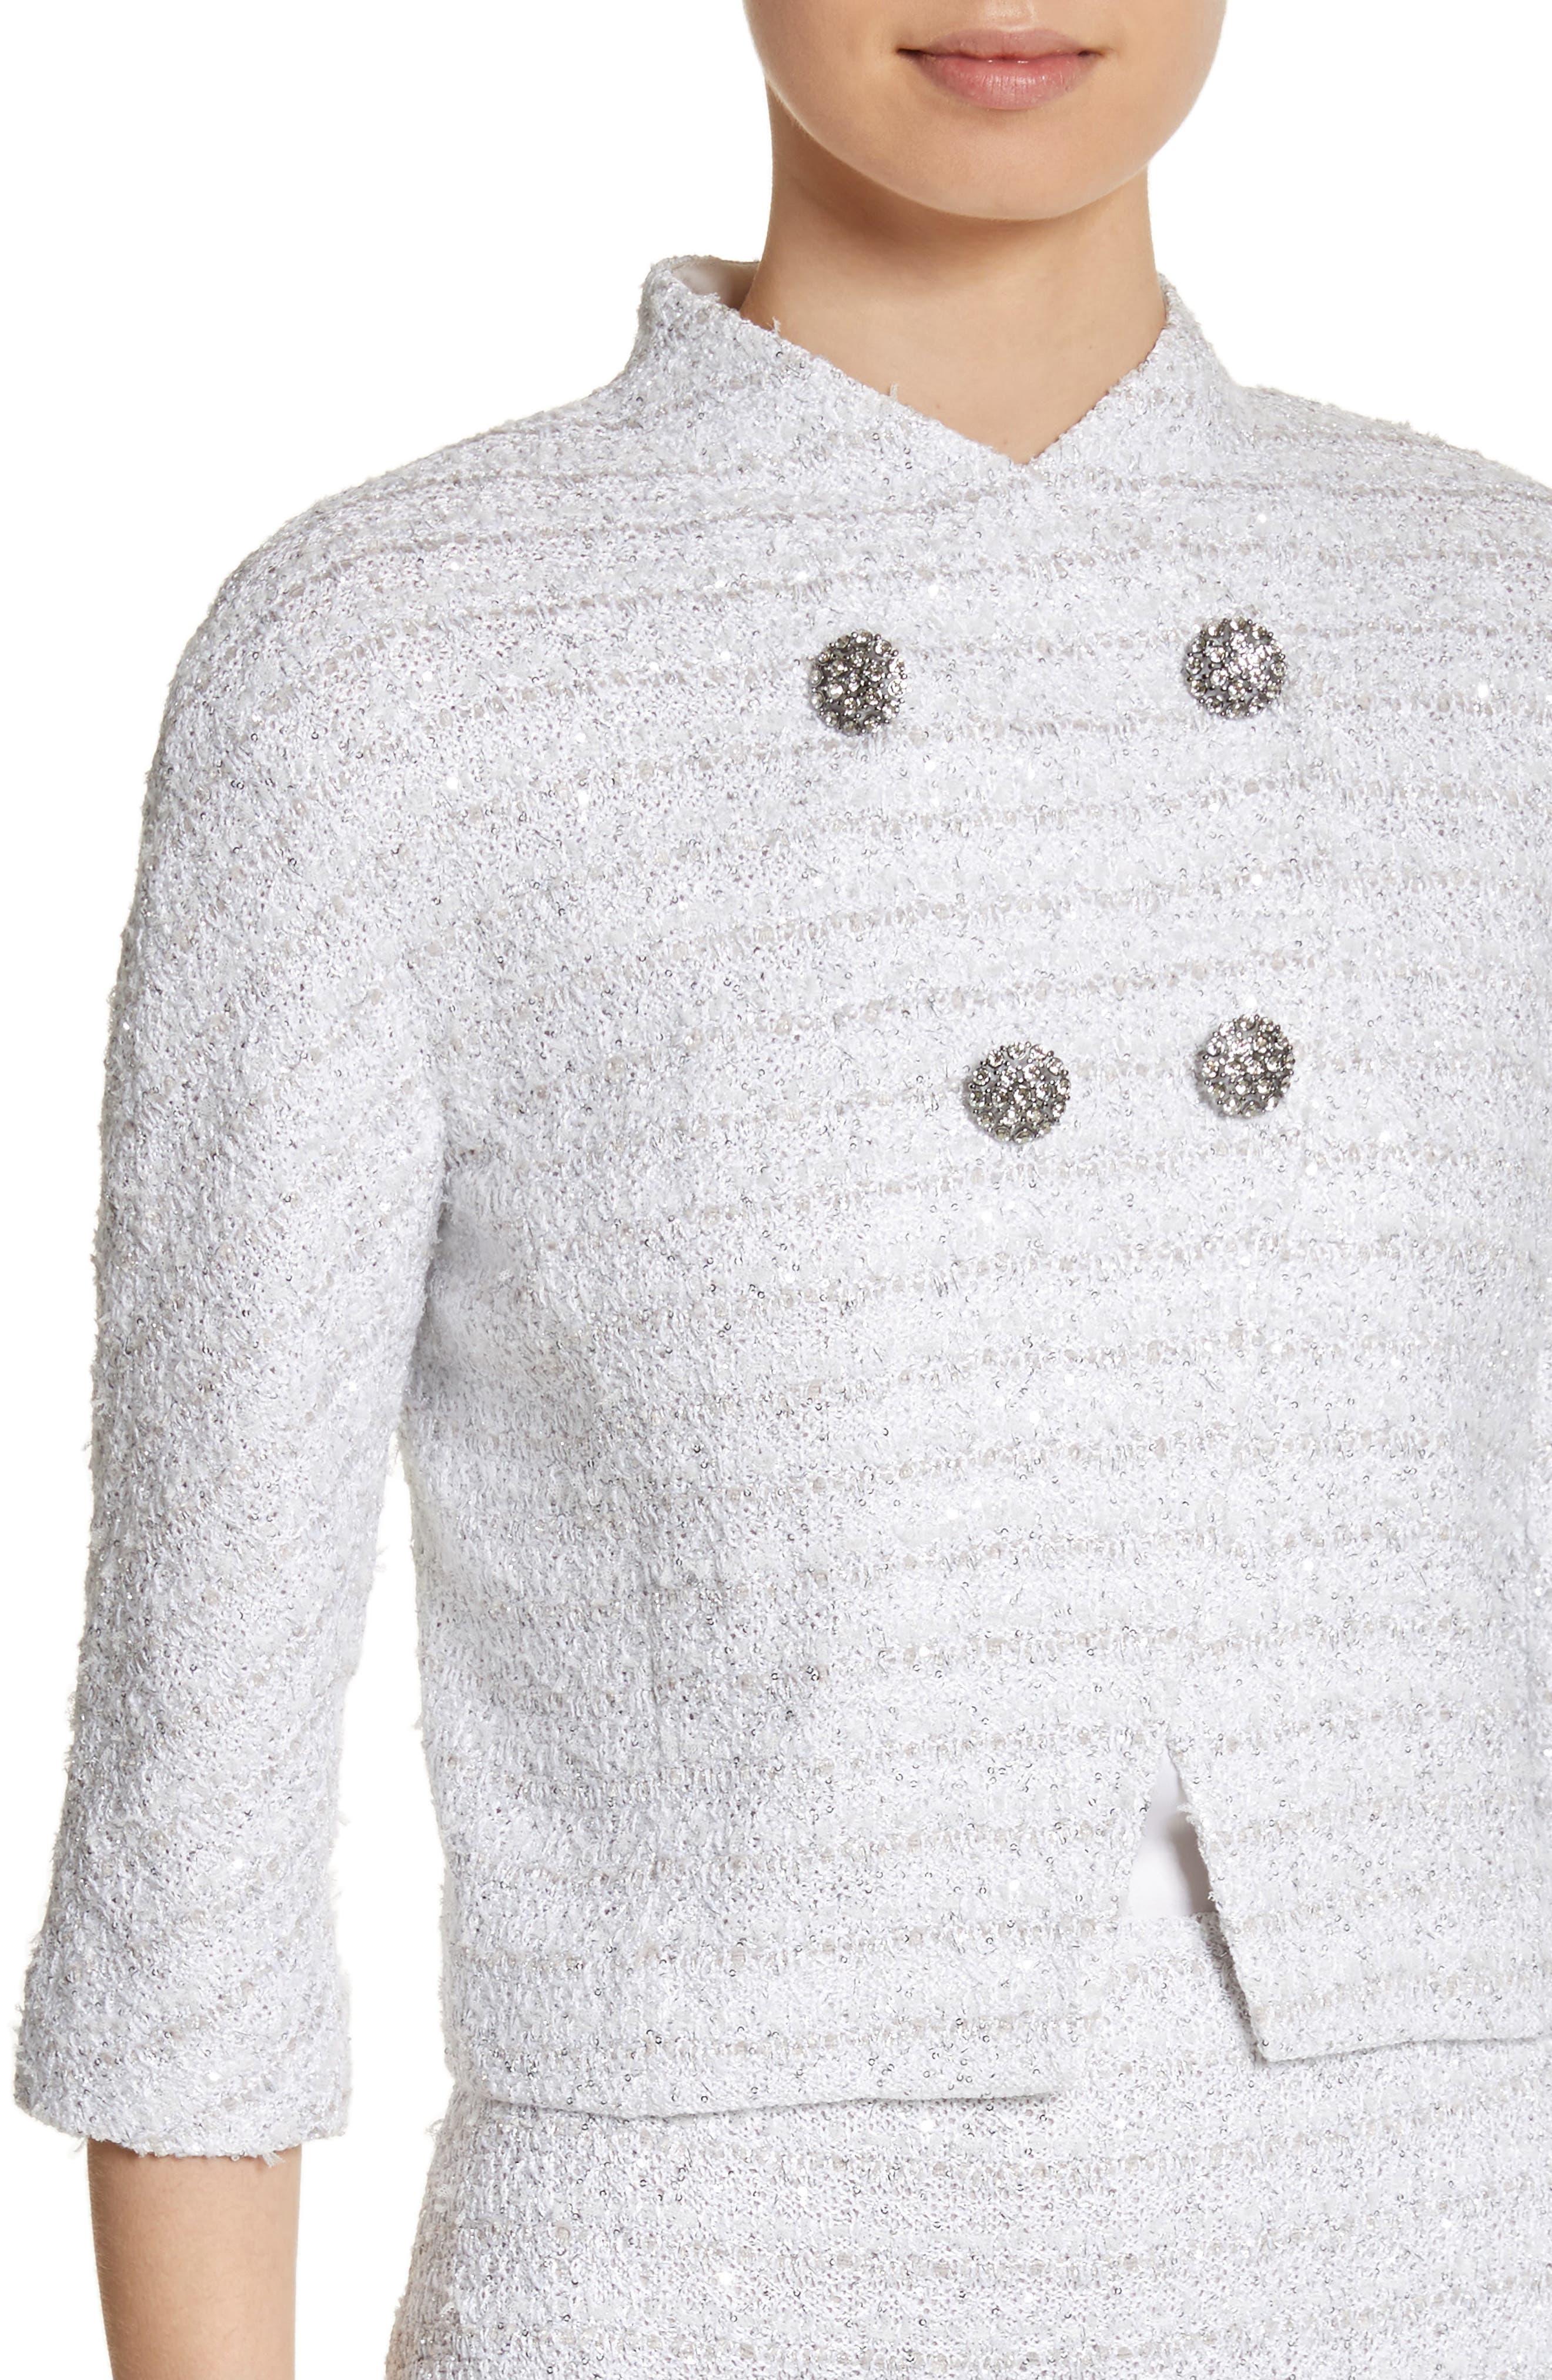 Frosted Metallic Tweed Jacket,                             Alternate thumbnail 4, color,                             Bianco Multi